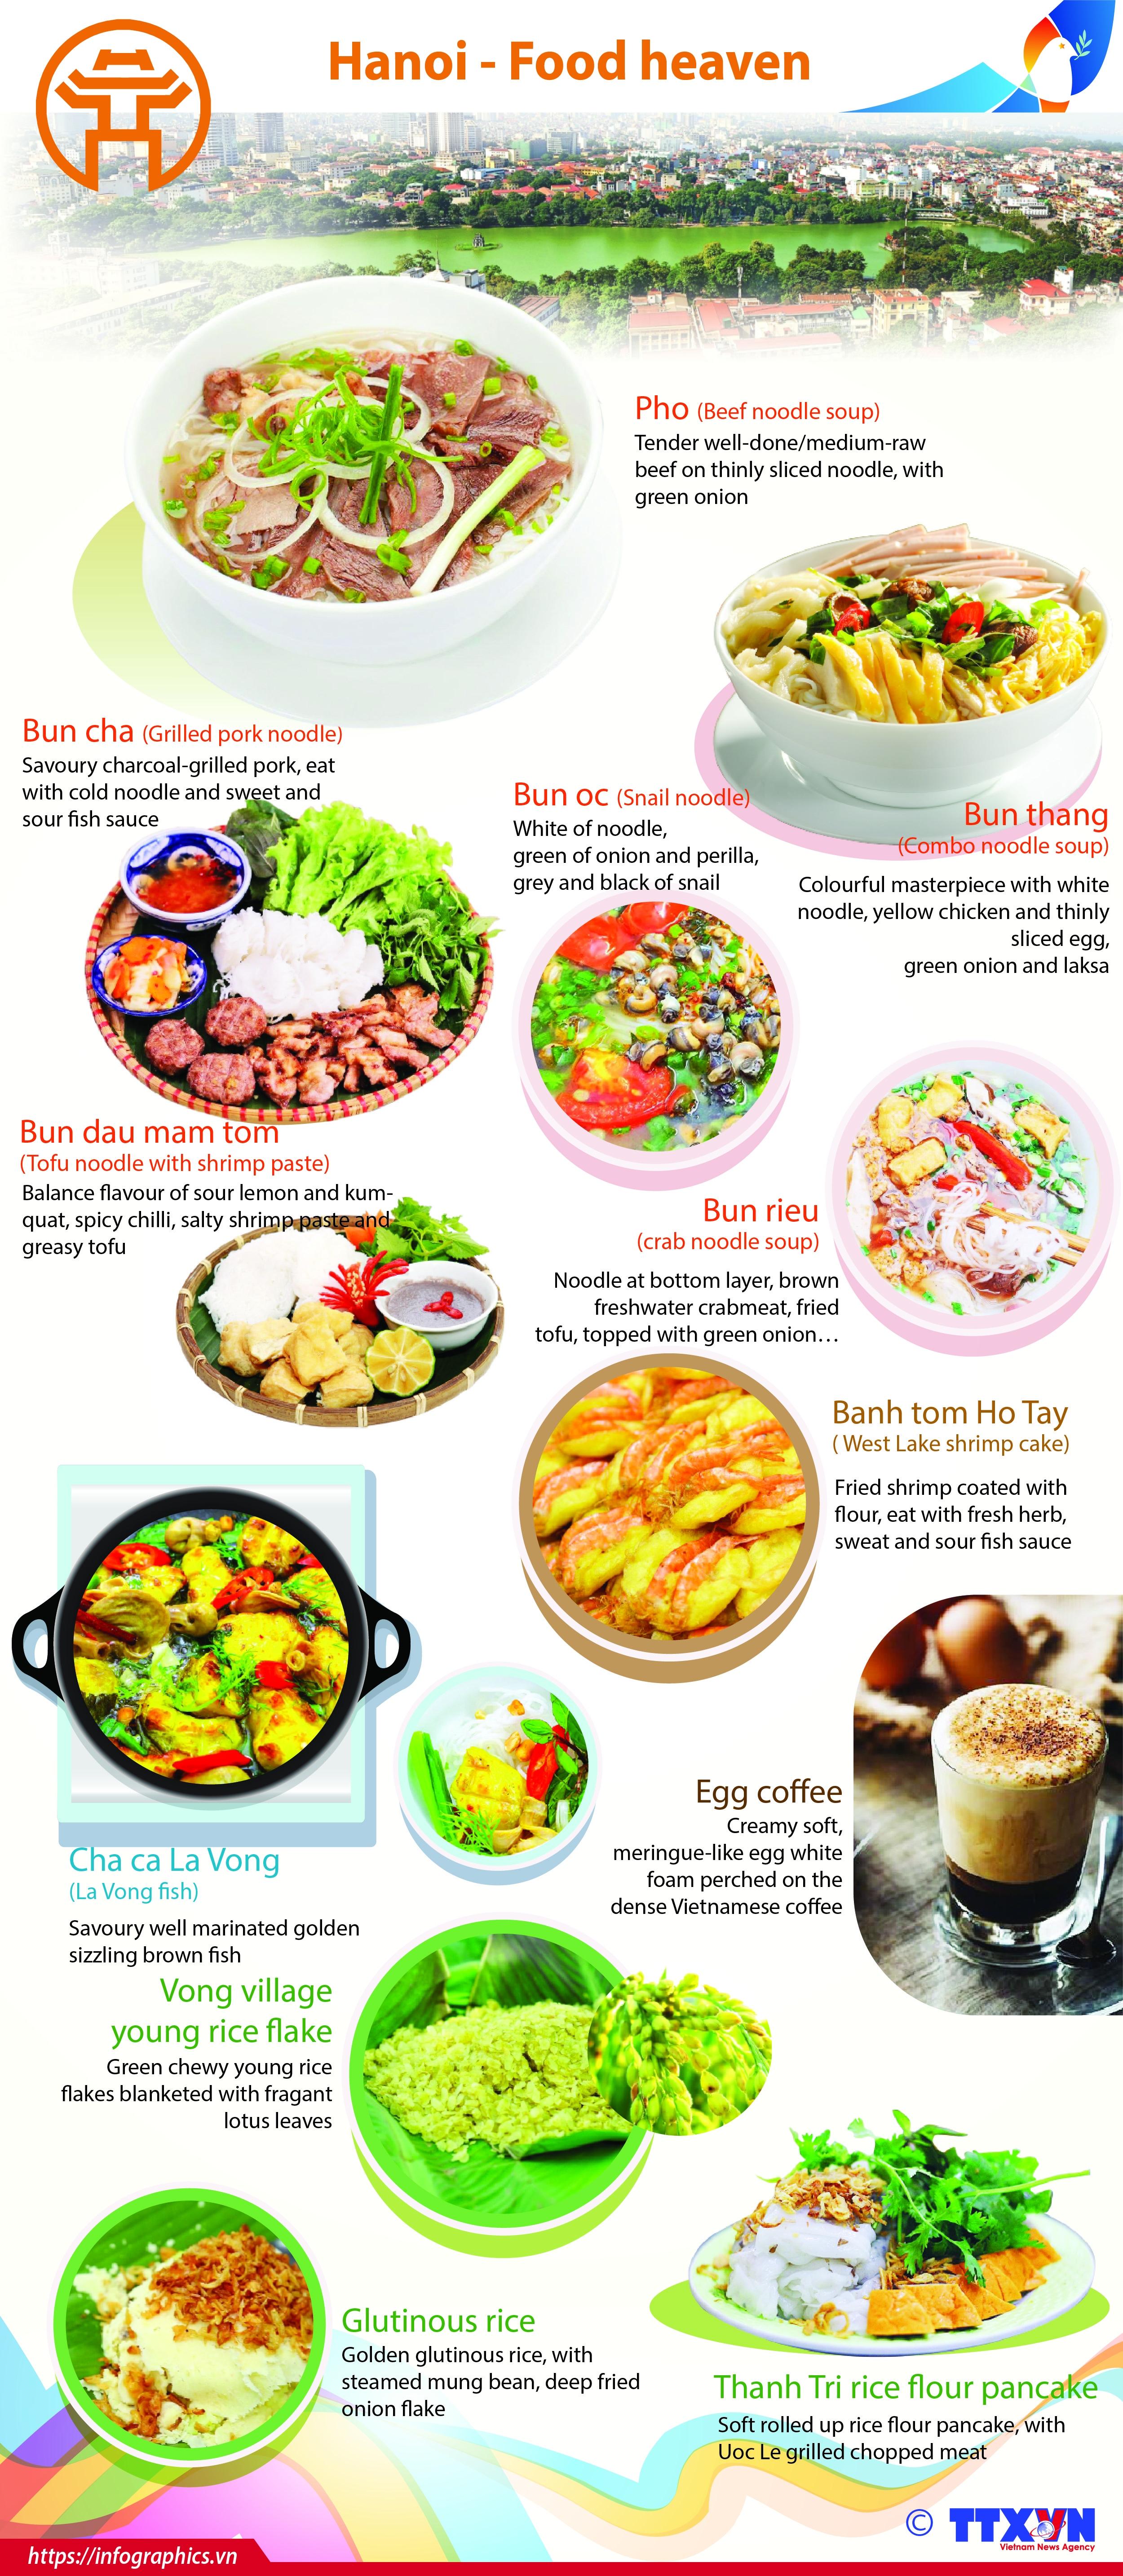 hanoi food heaven